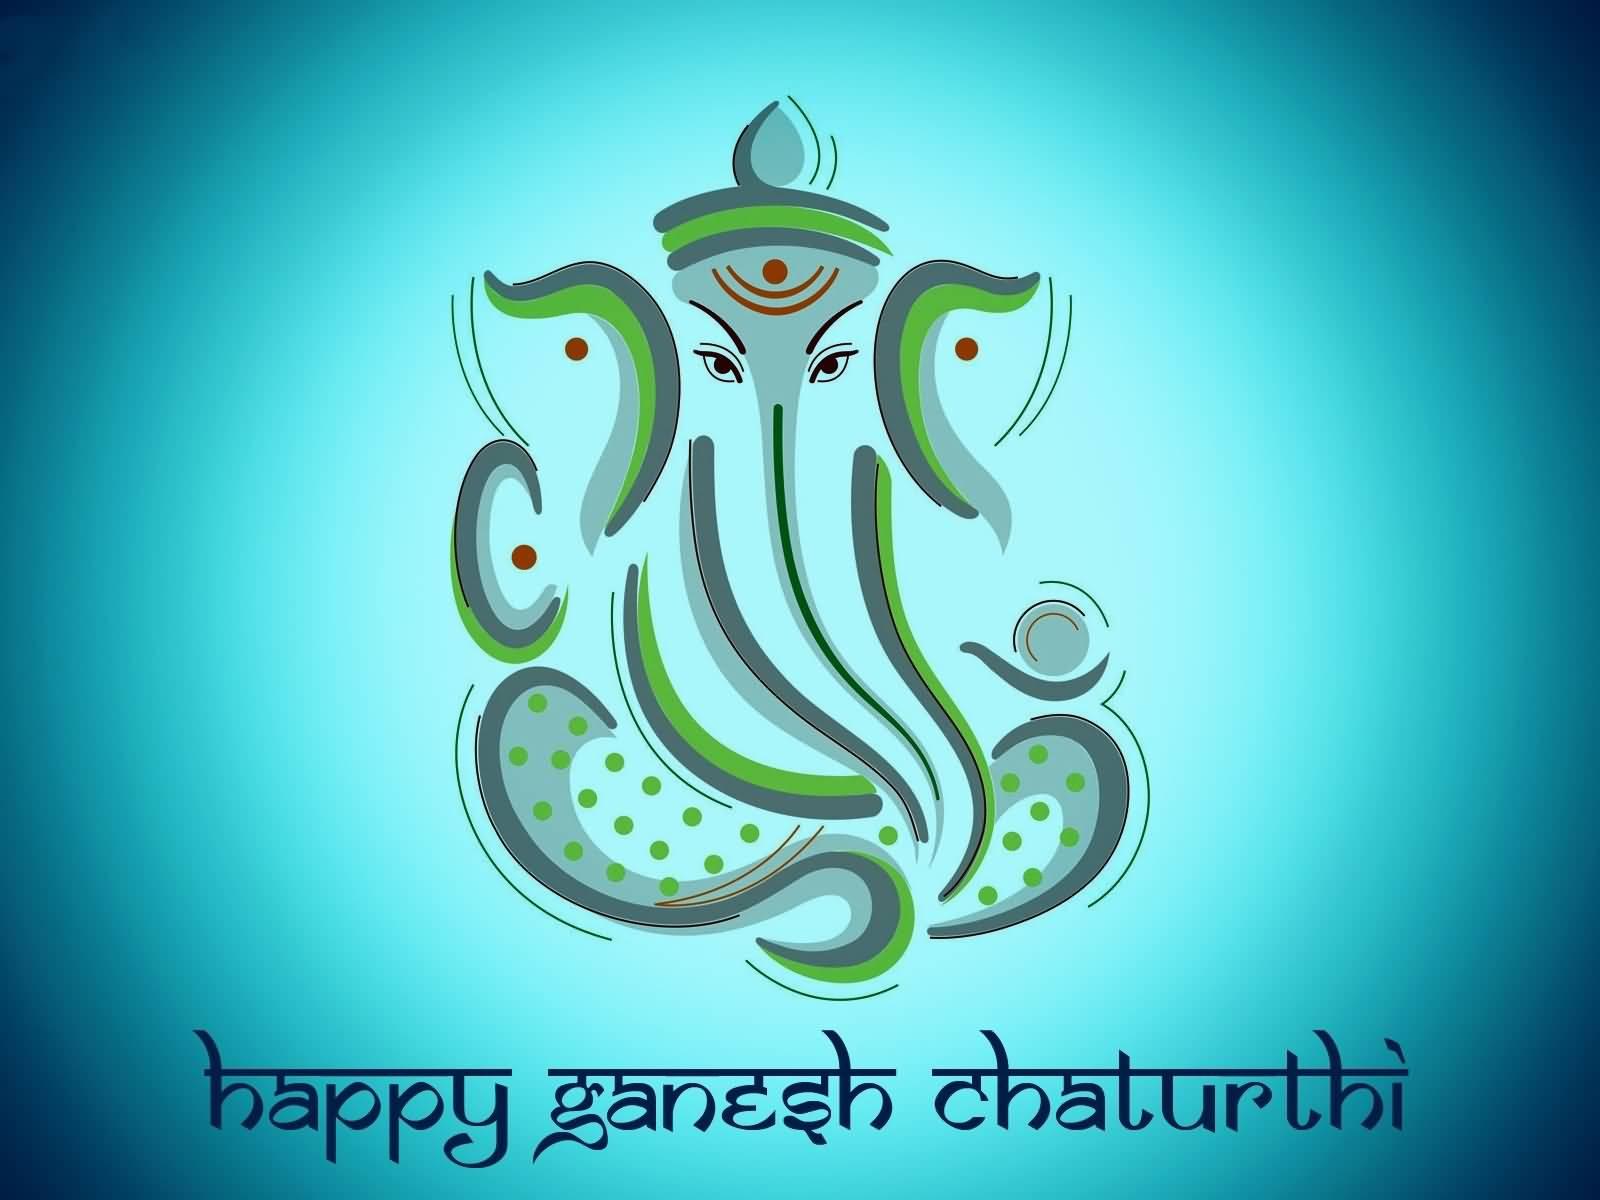 50 best ideas about ganesha chaturthi 2017 wishes happy ganesh chaturthi beautiful greeting card m4hsunfo